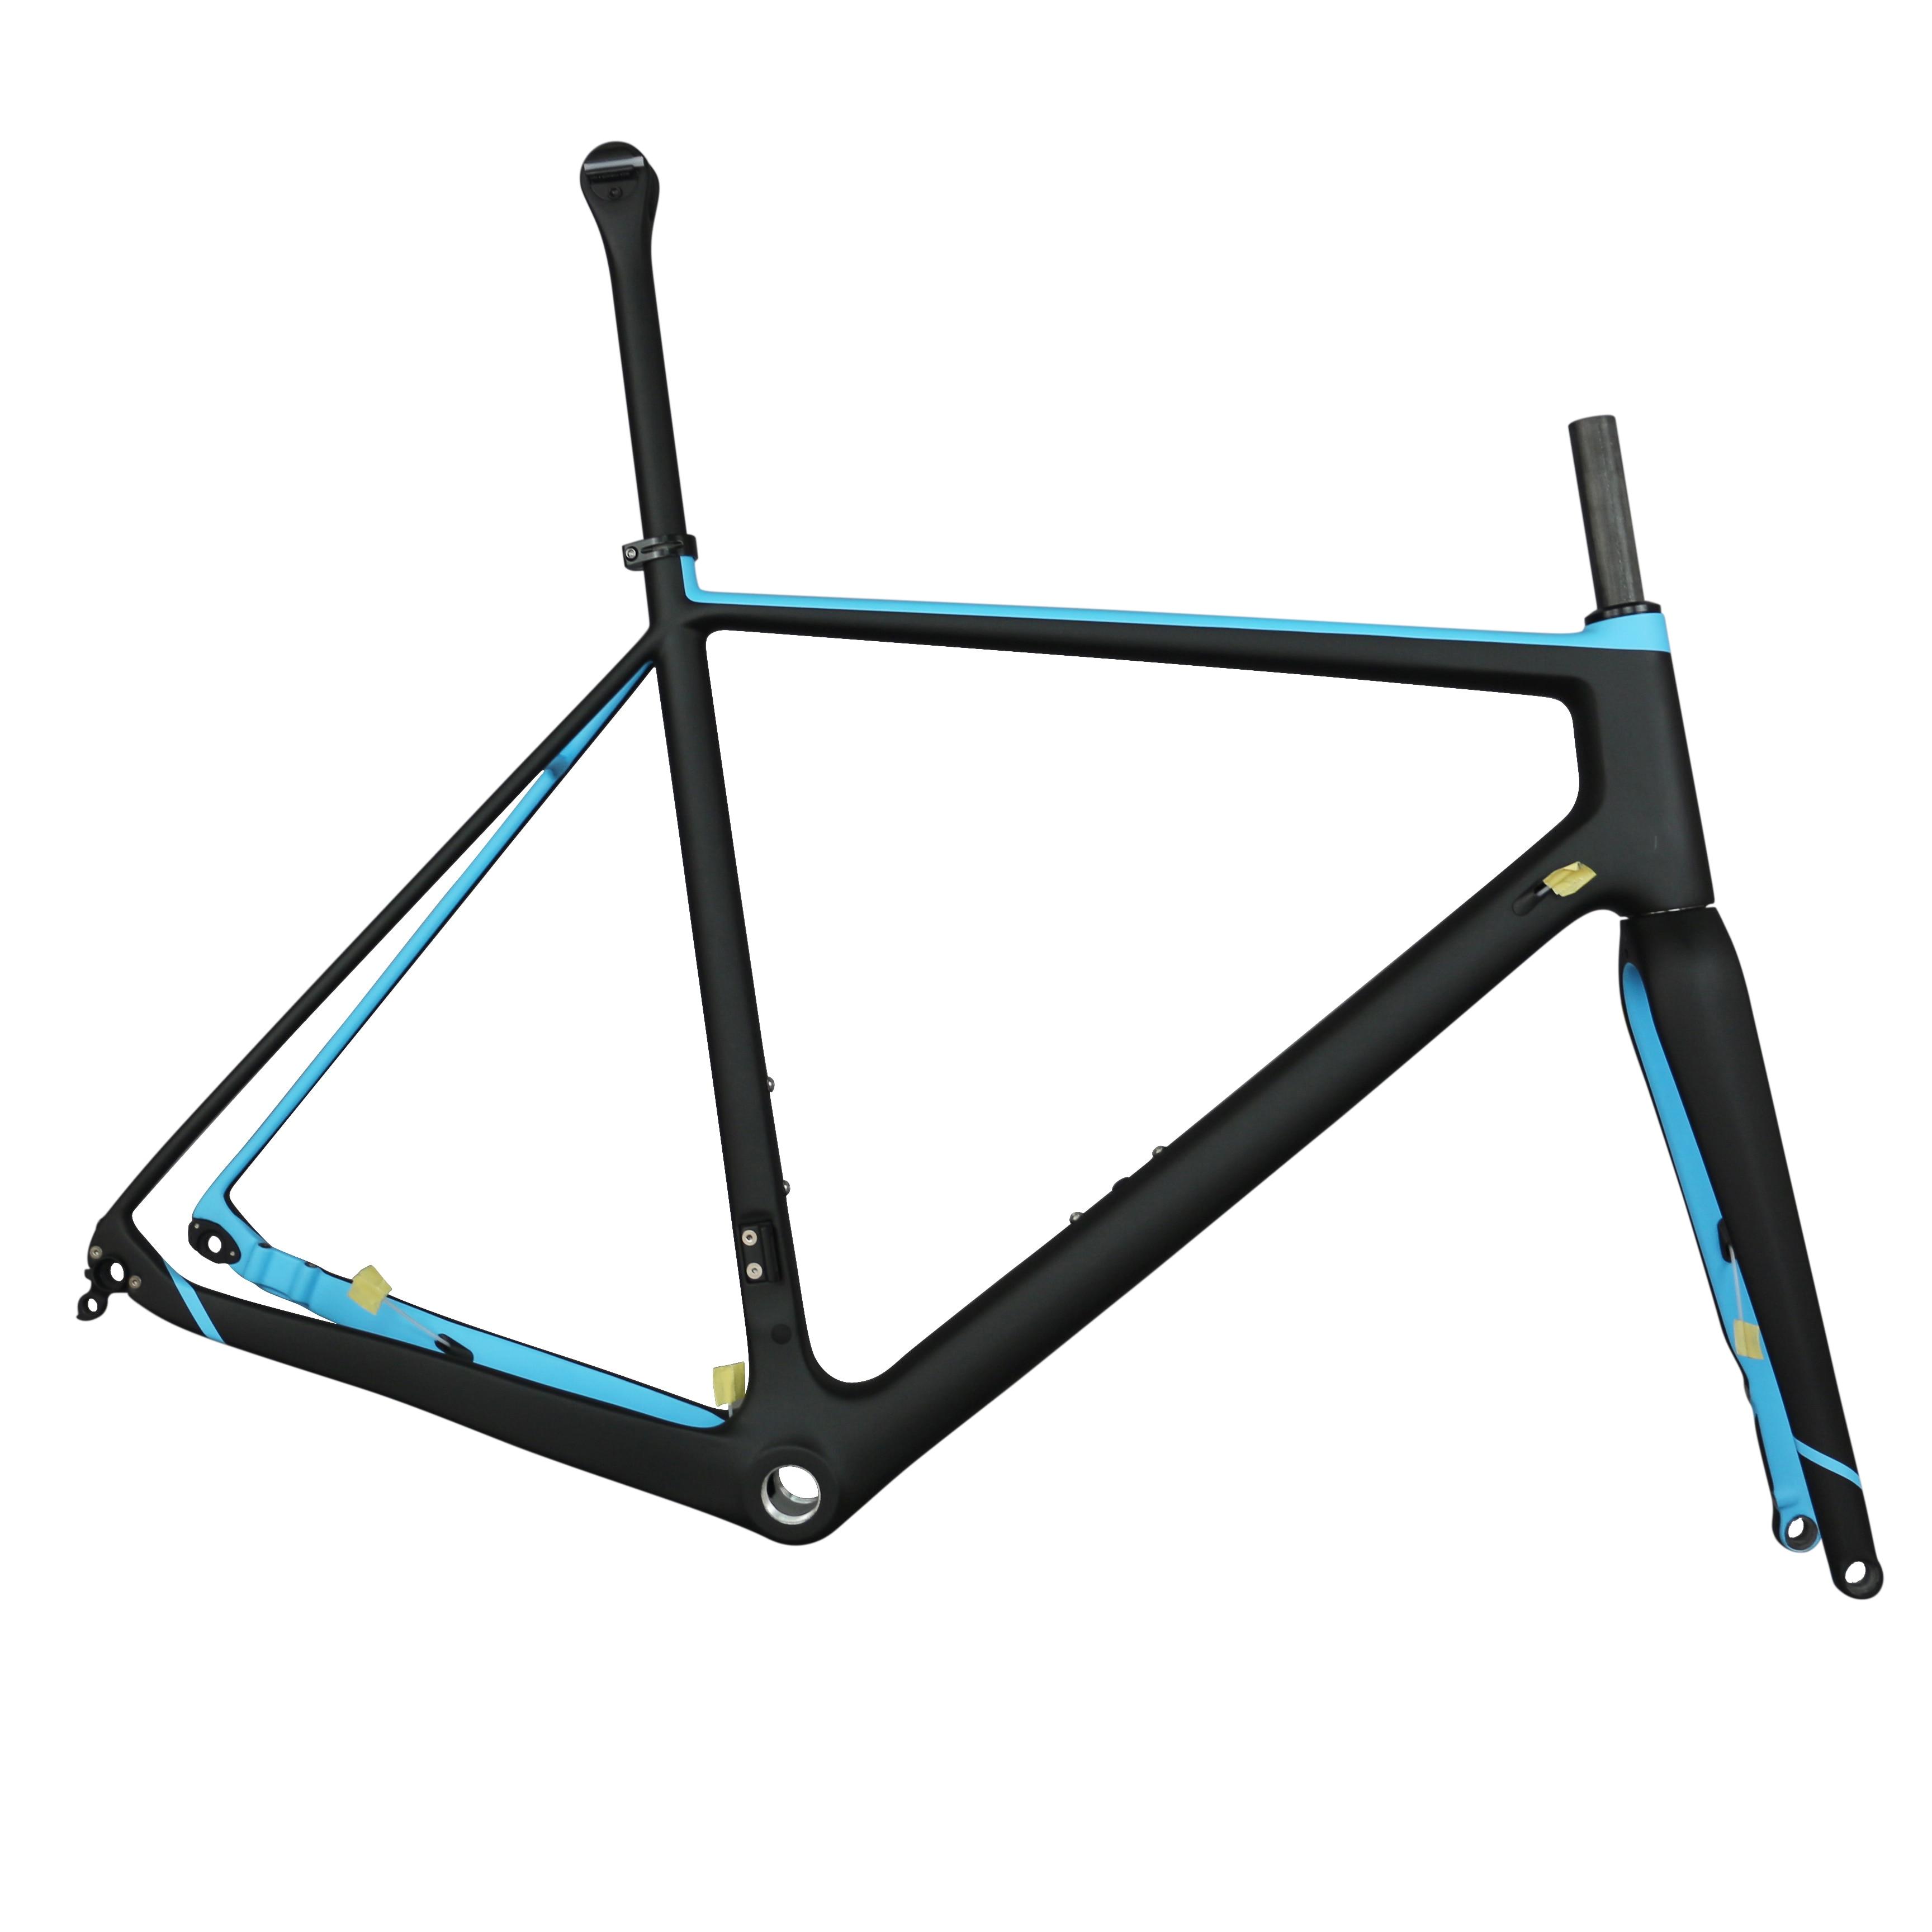 FlatmountgravelDiscbrake Toray Carbon Fiber T700 Bike Frame GR029  BSA Or BB30 With 12x142 Alxe Thru Accept Custom Paint